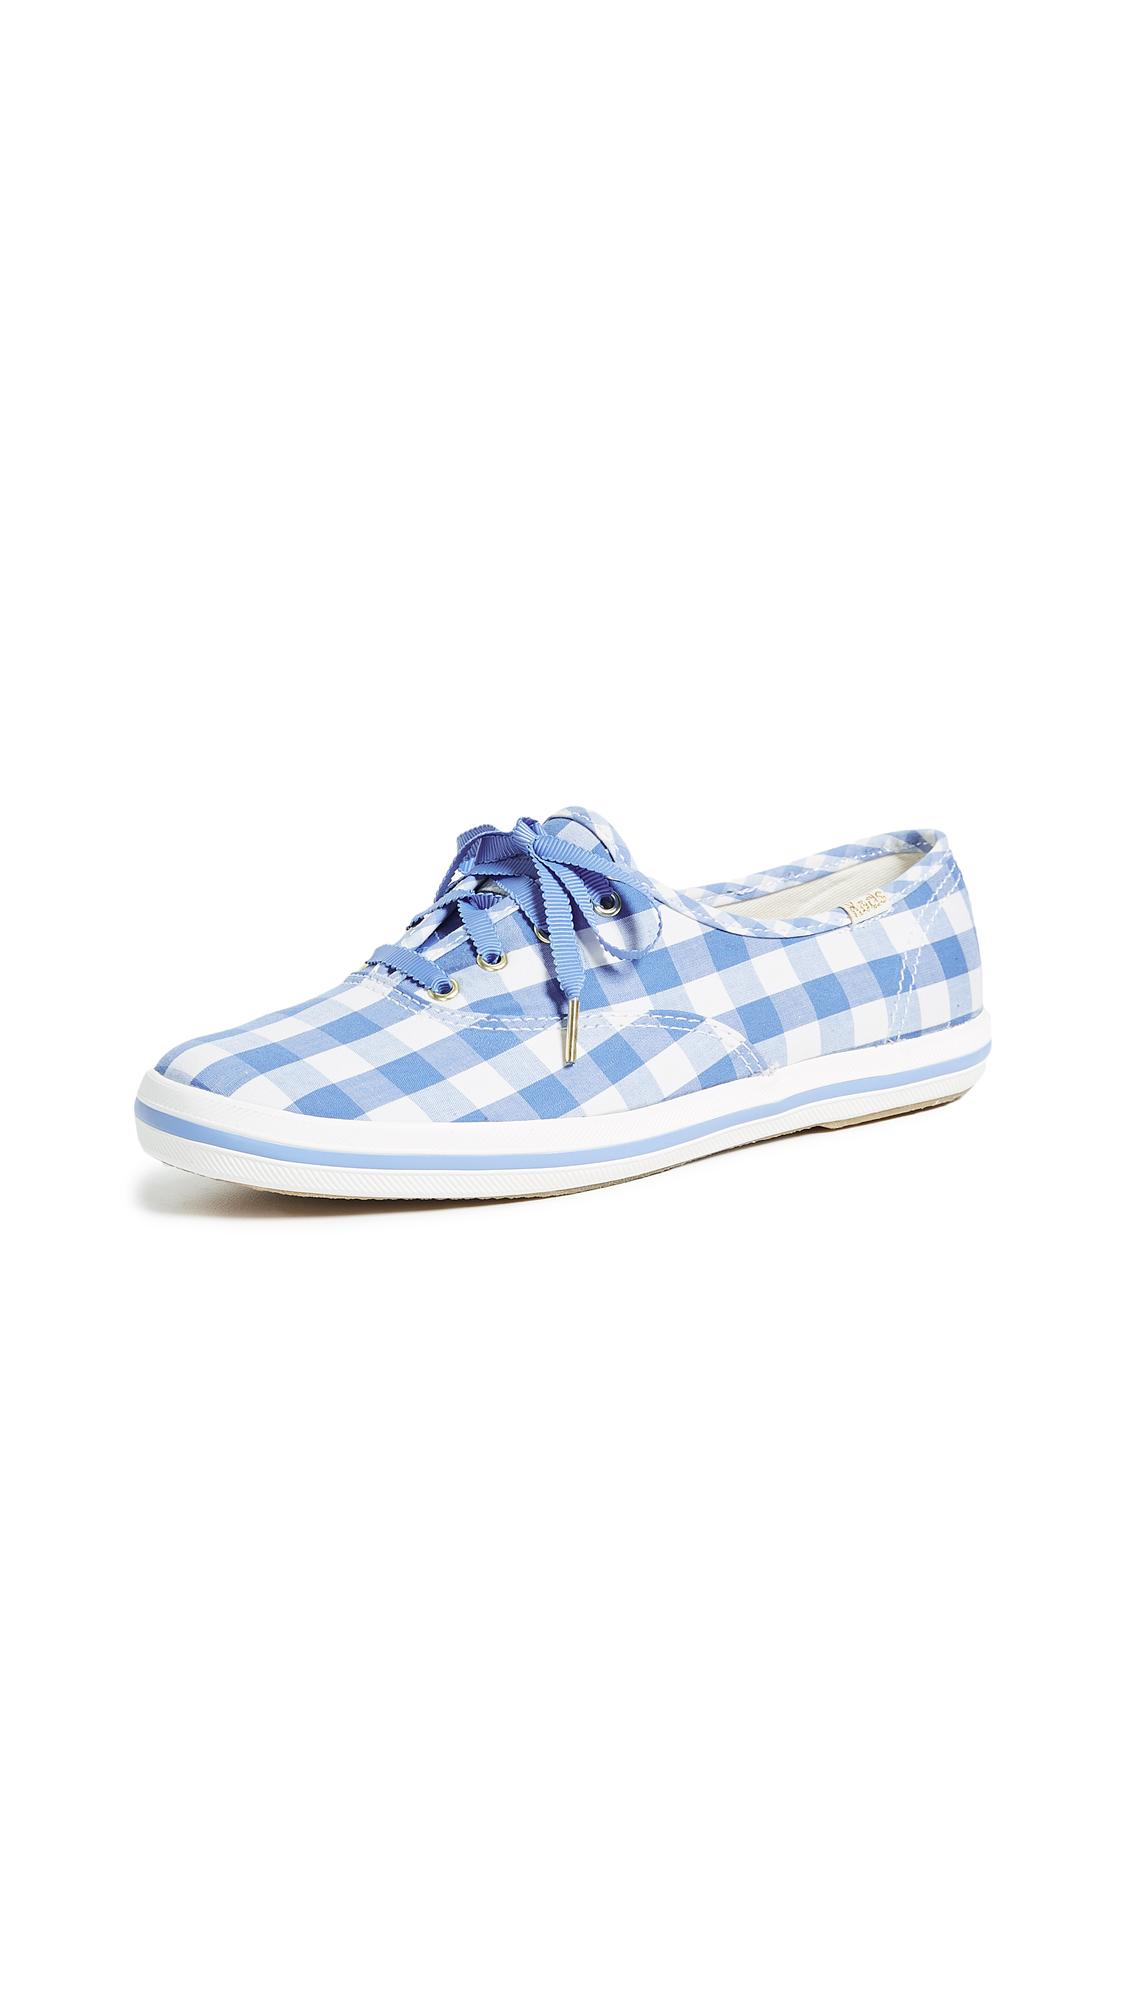 Keds x Kate Spade New York Gingham Sneakers - Periwinkle